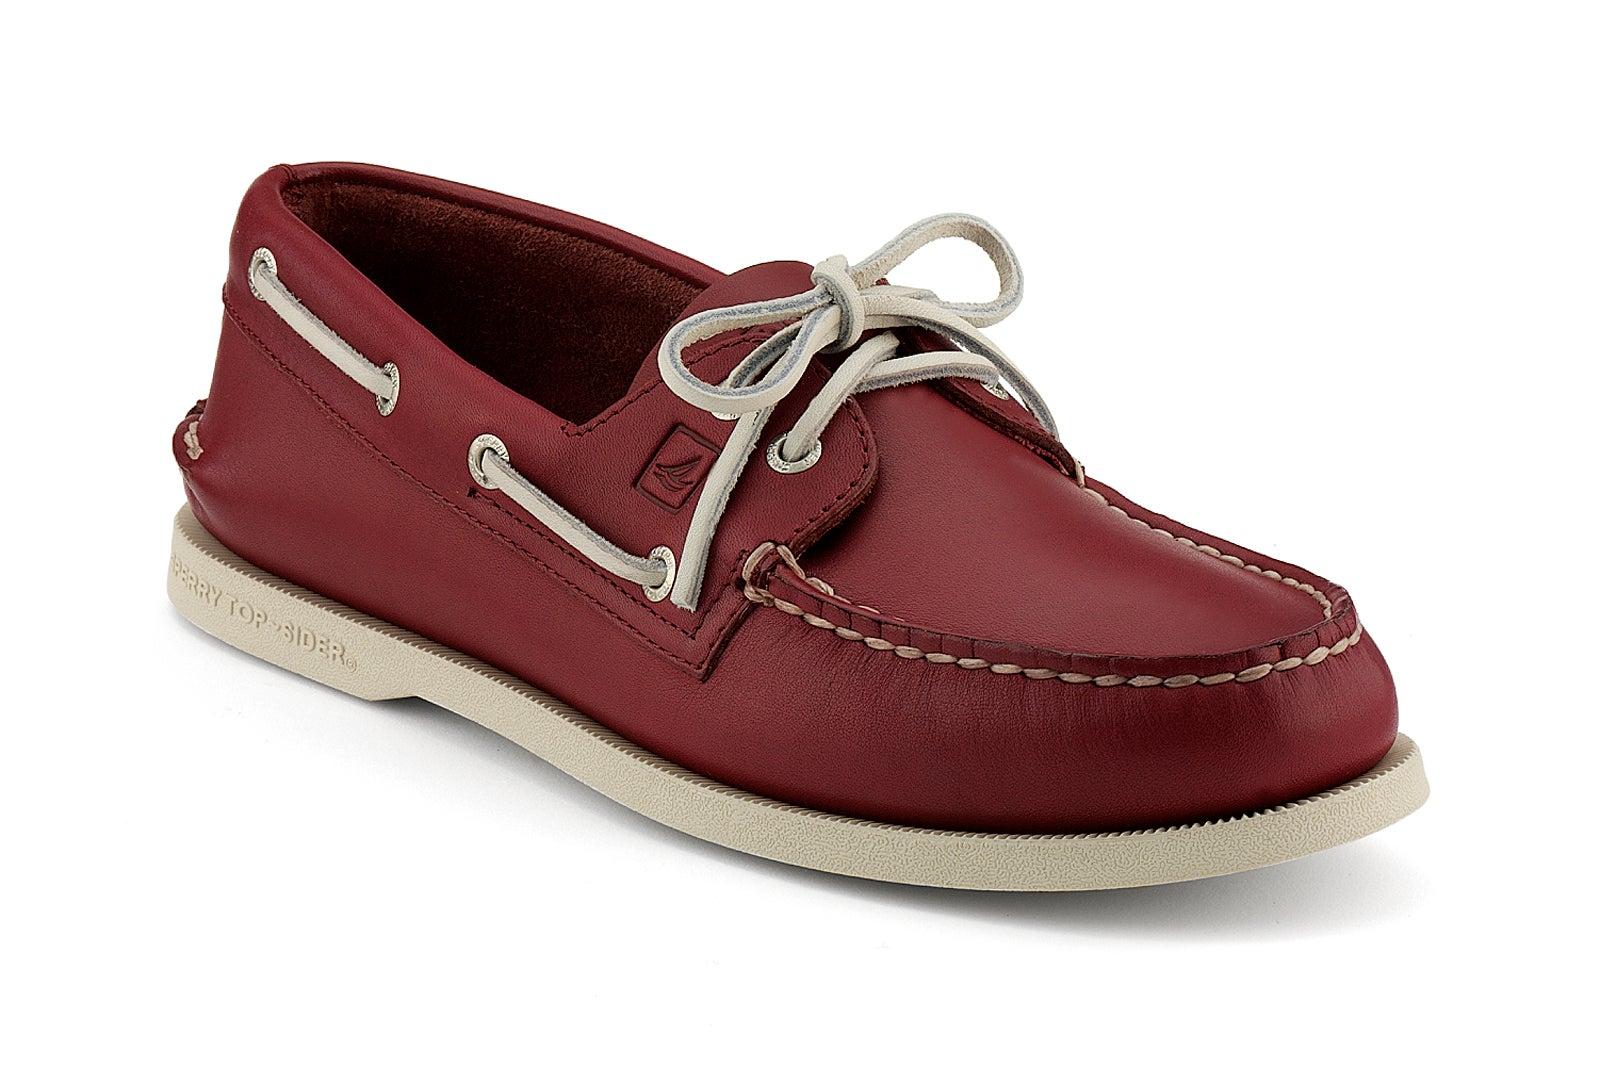 2b43c7c7ec Customizable Sperry Topsider Boat Shoe